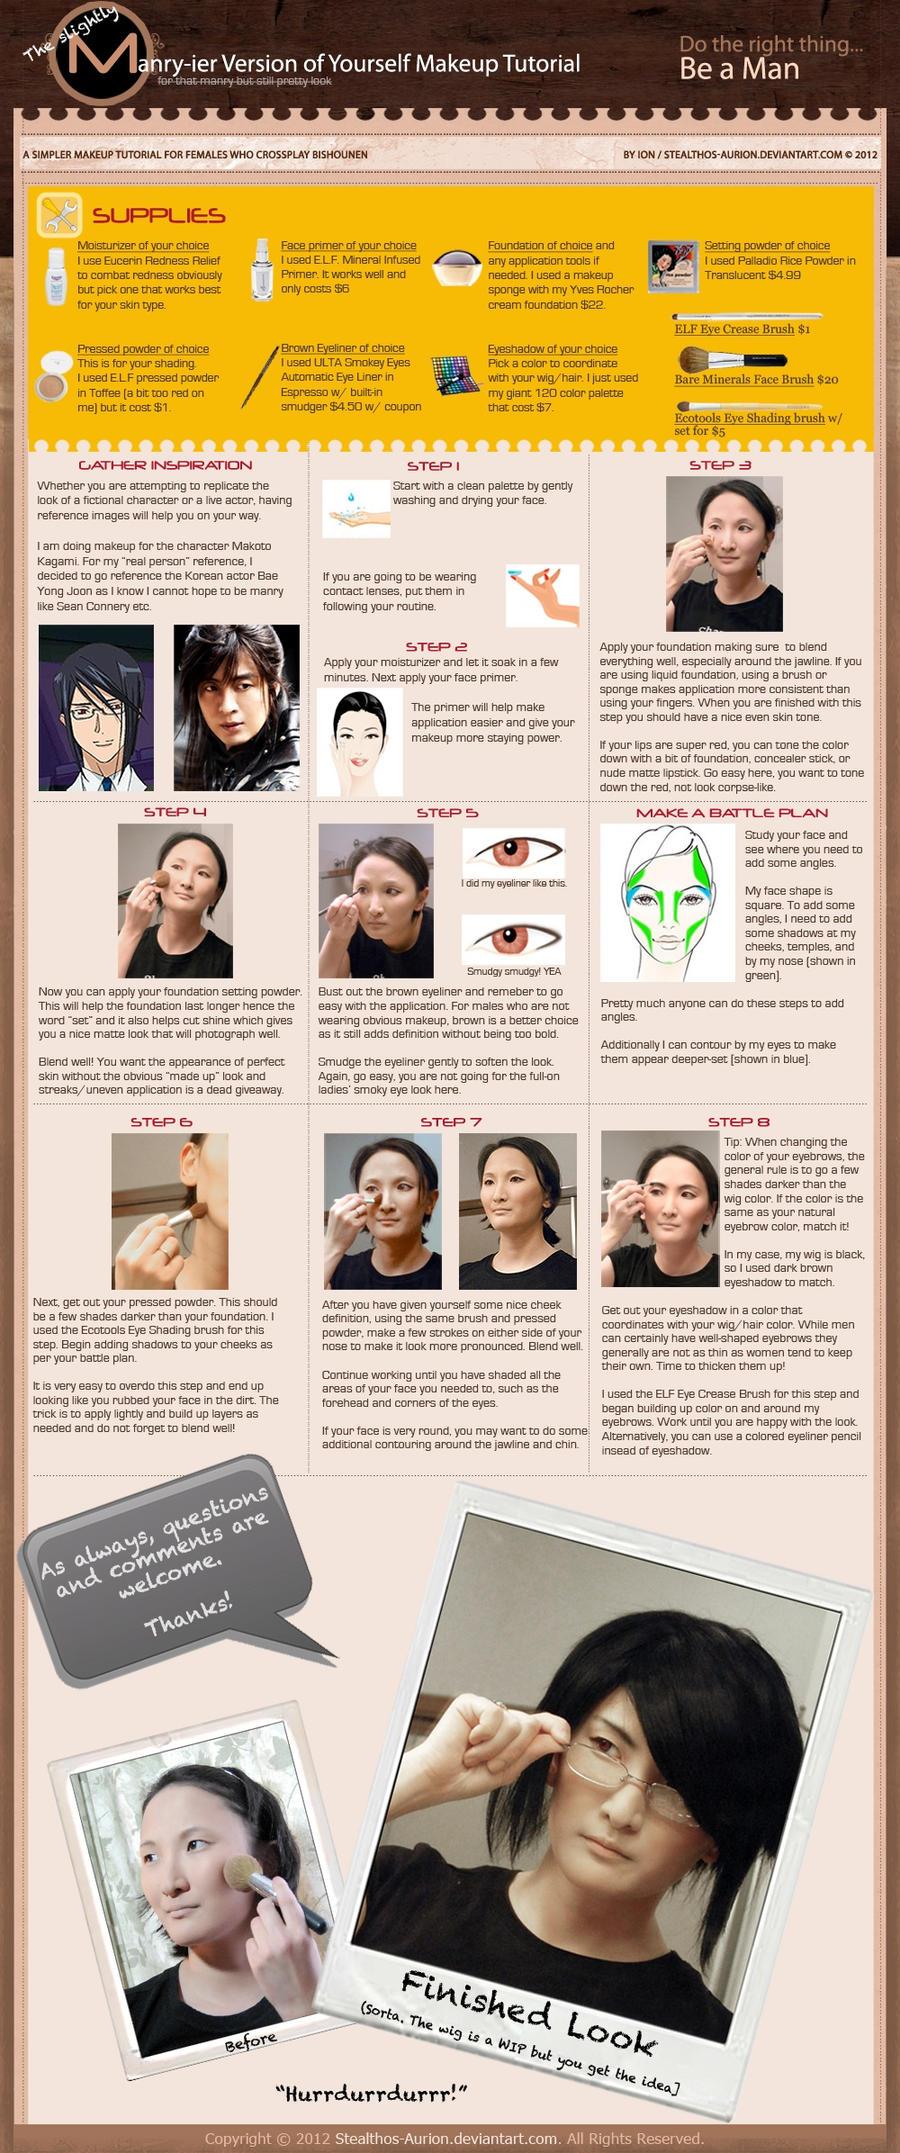 The Slightly Manry-ier Makeup Tutorial